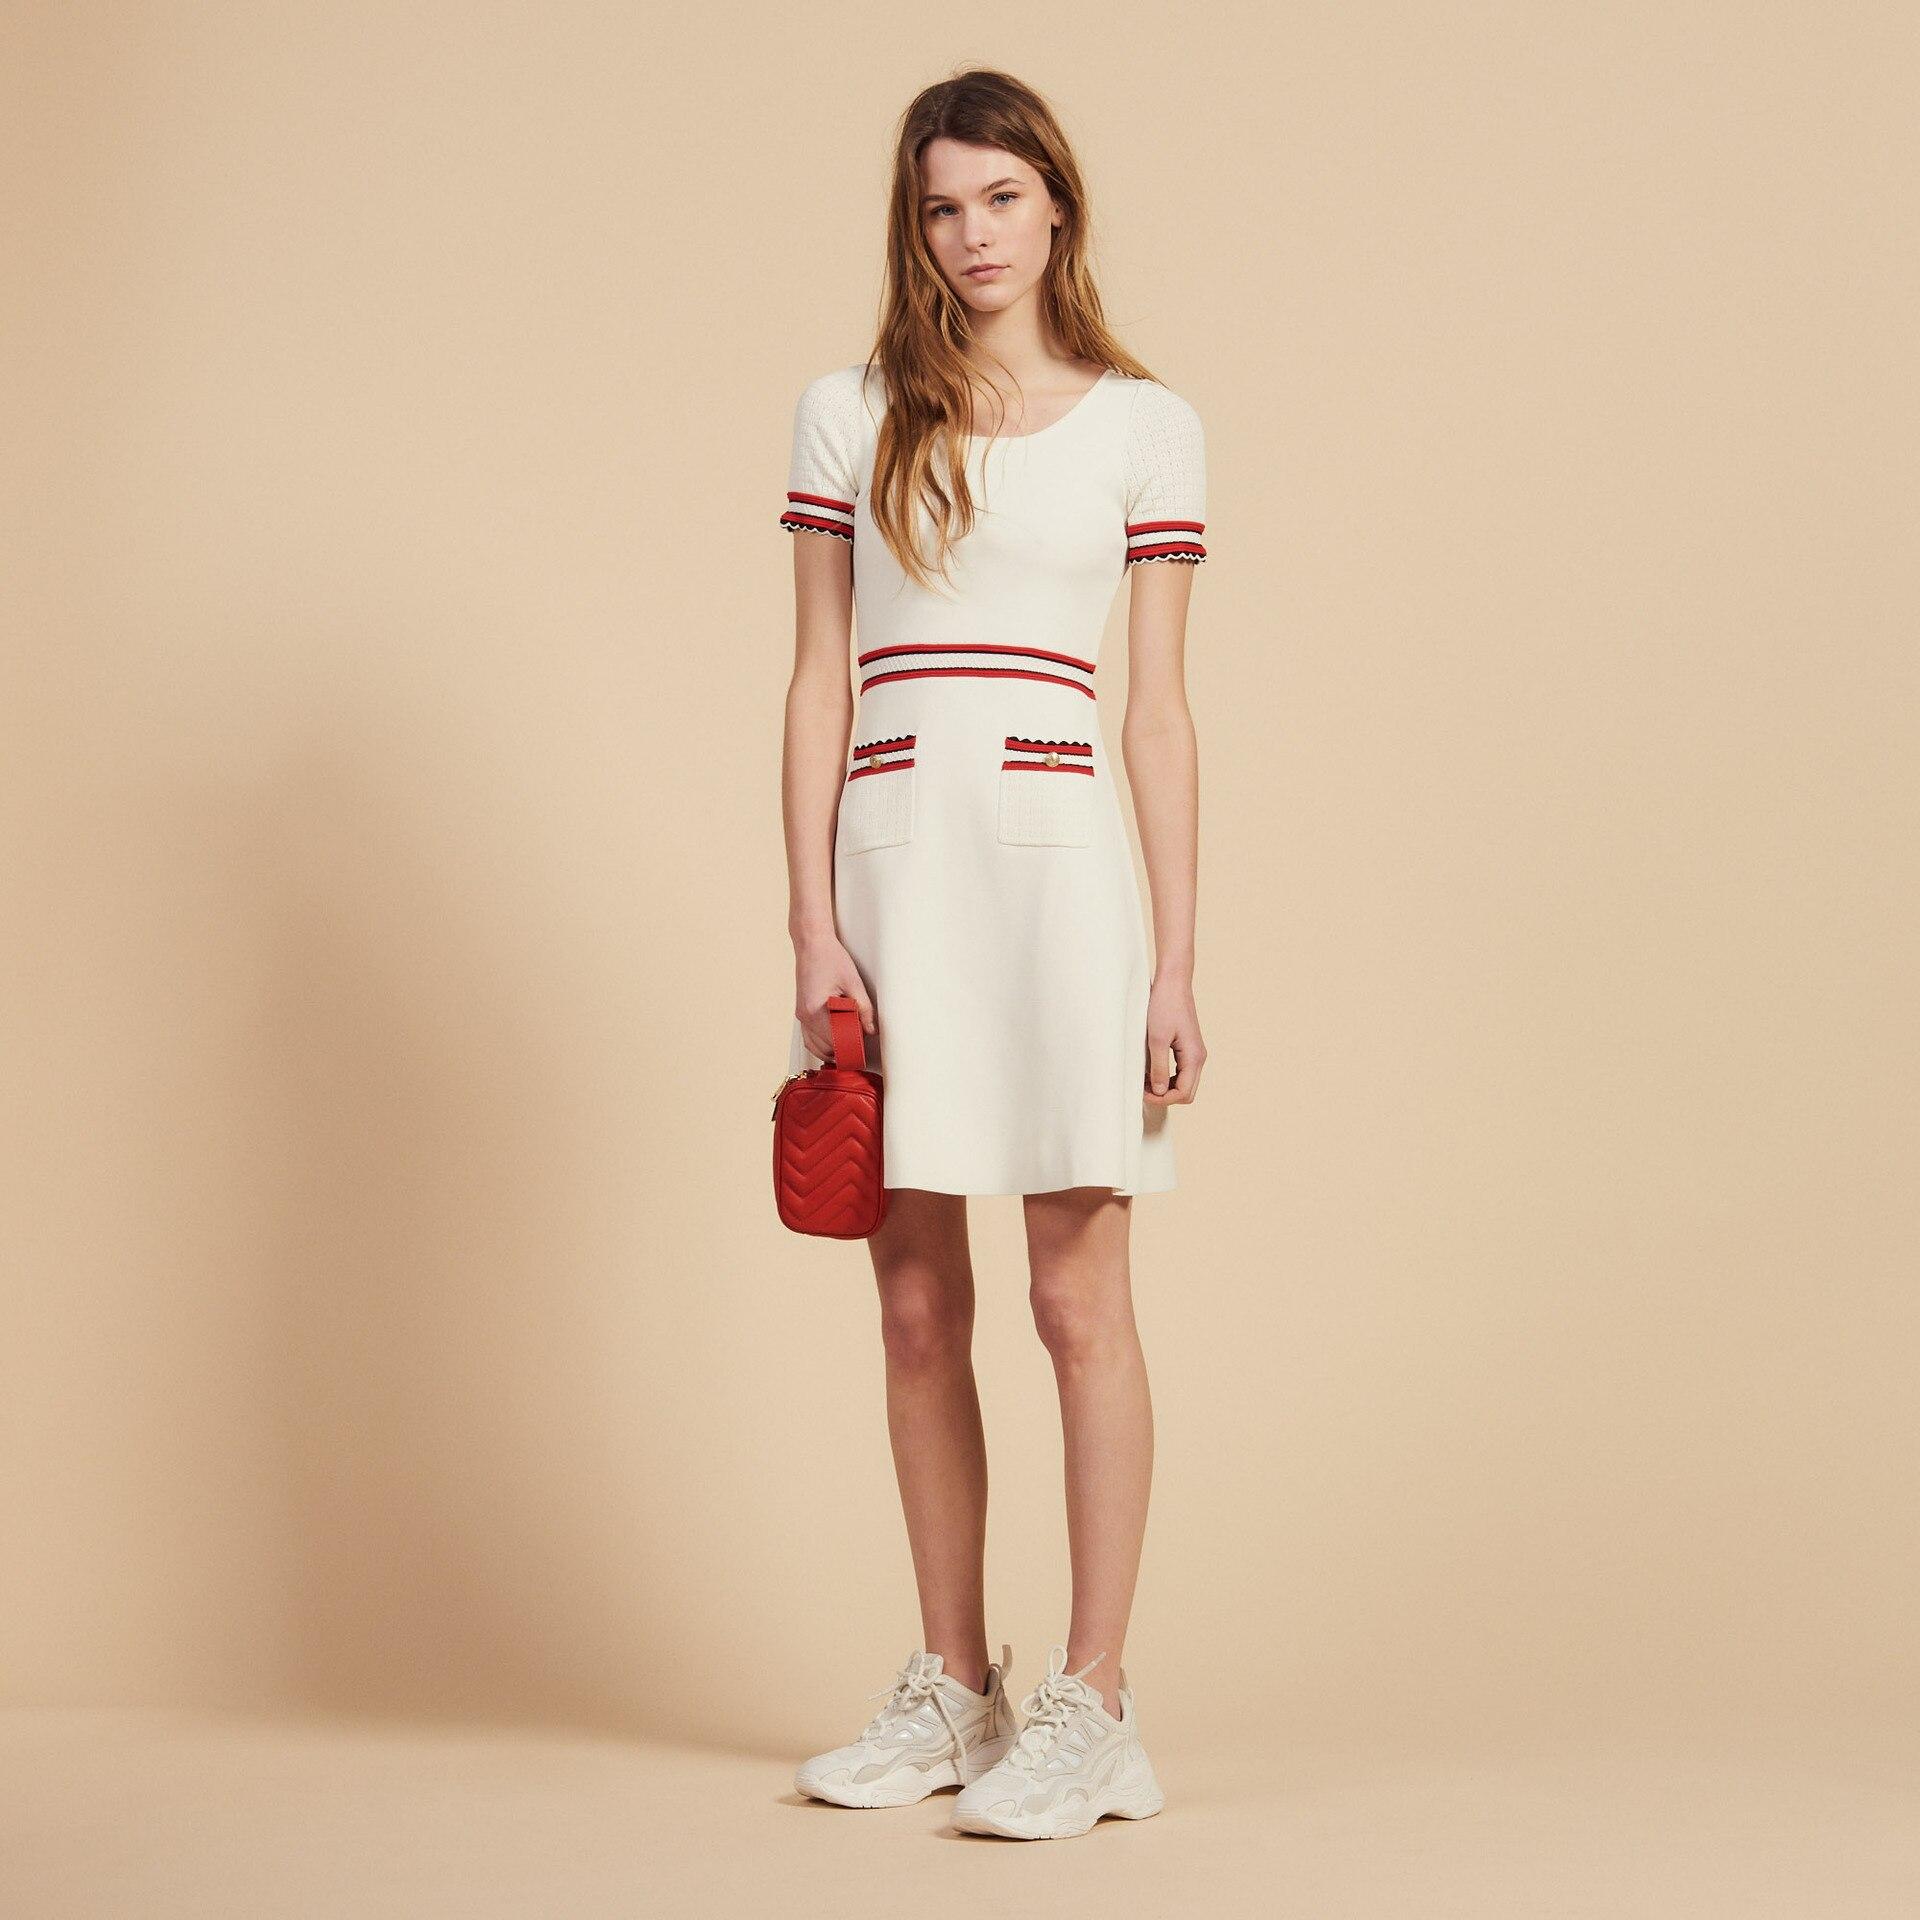 Women Dress 2019 Spring and Summer New Round Neck Stitching Pocket Dress